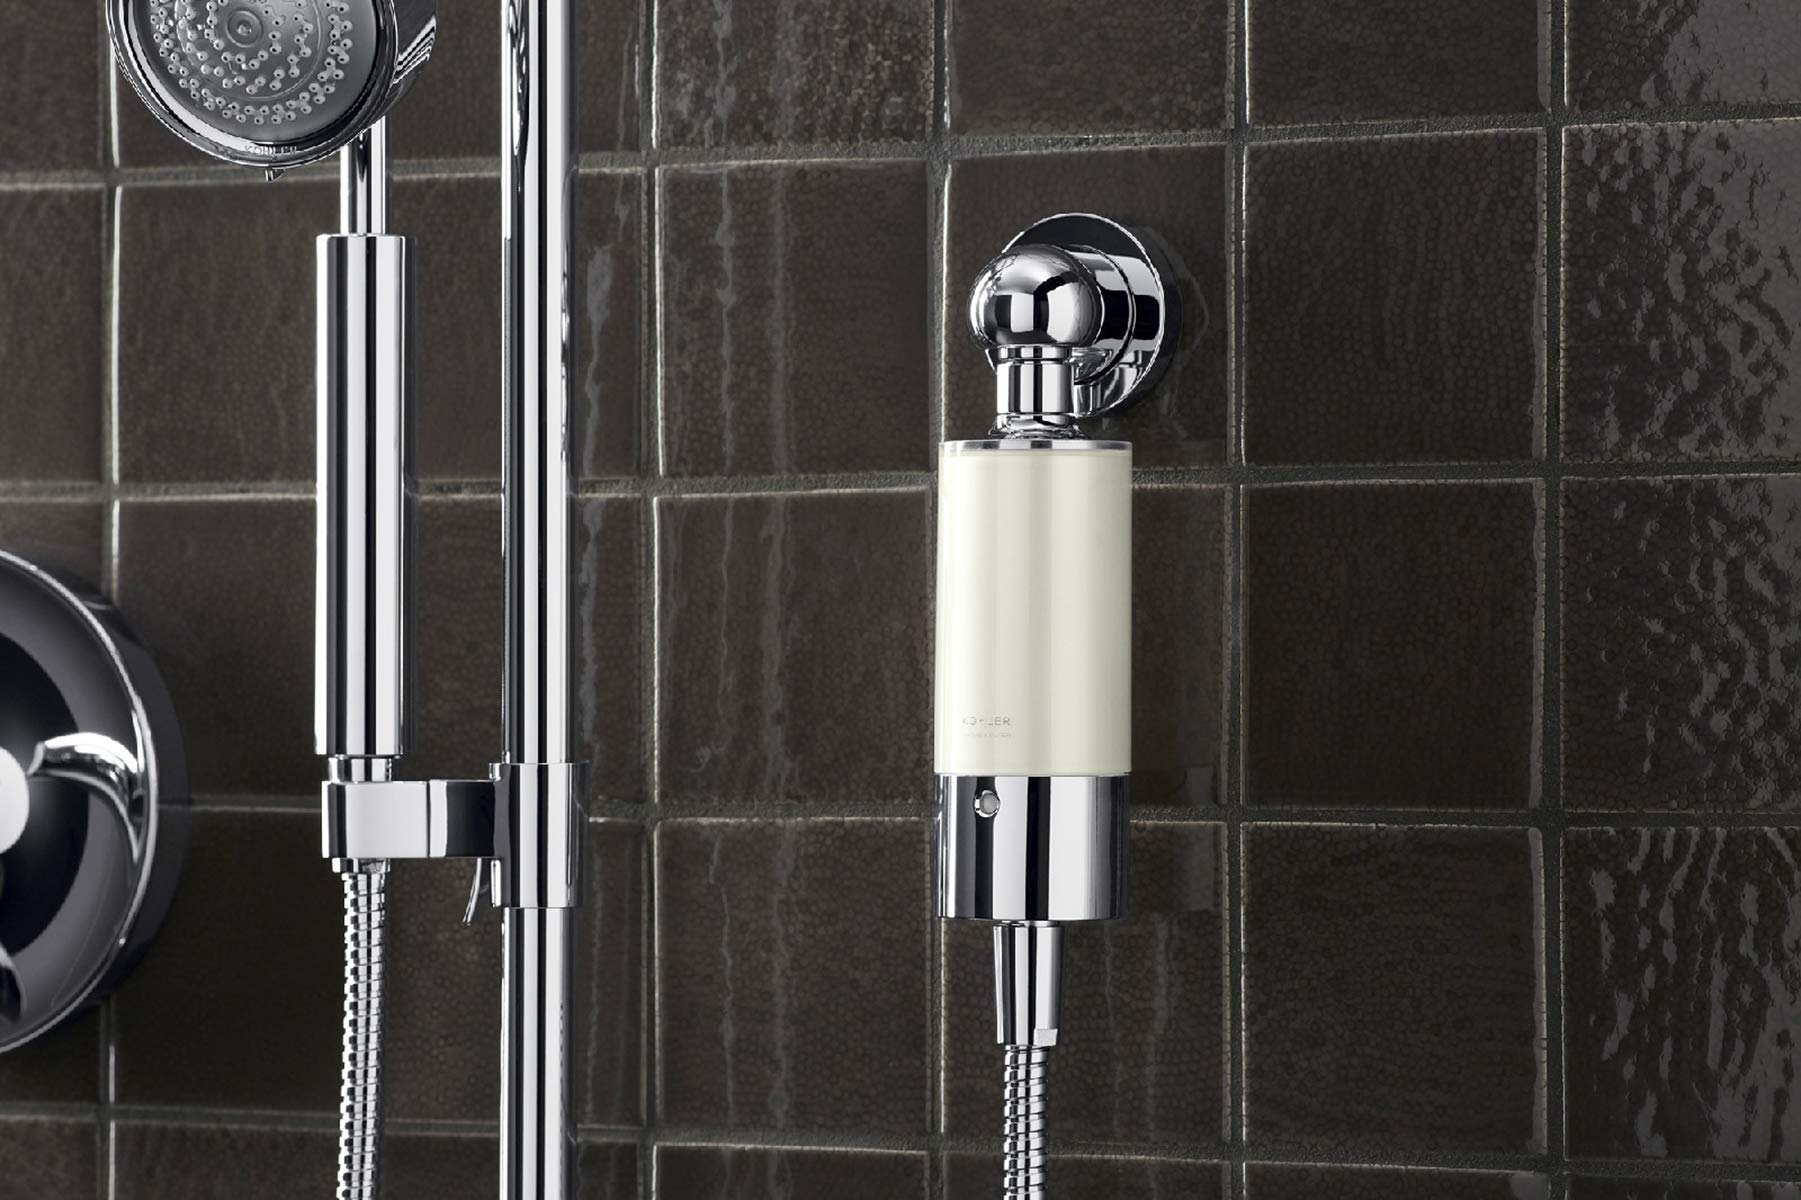 Kohler 30646-CP Aquifer Shower Water Filtration System, Reduce Chlorine and Odor, Includes Filter Replacement by Kohler (Image #7)